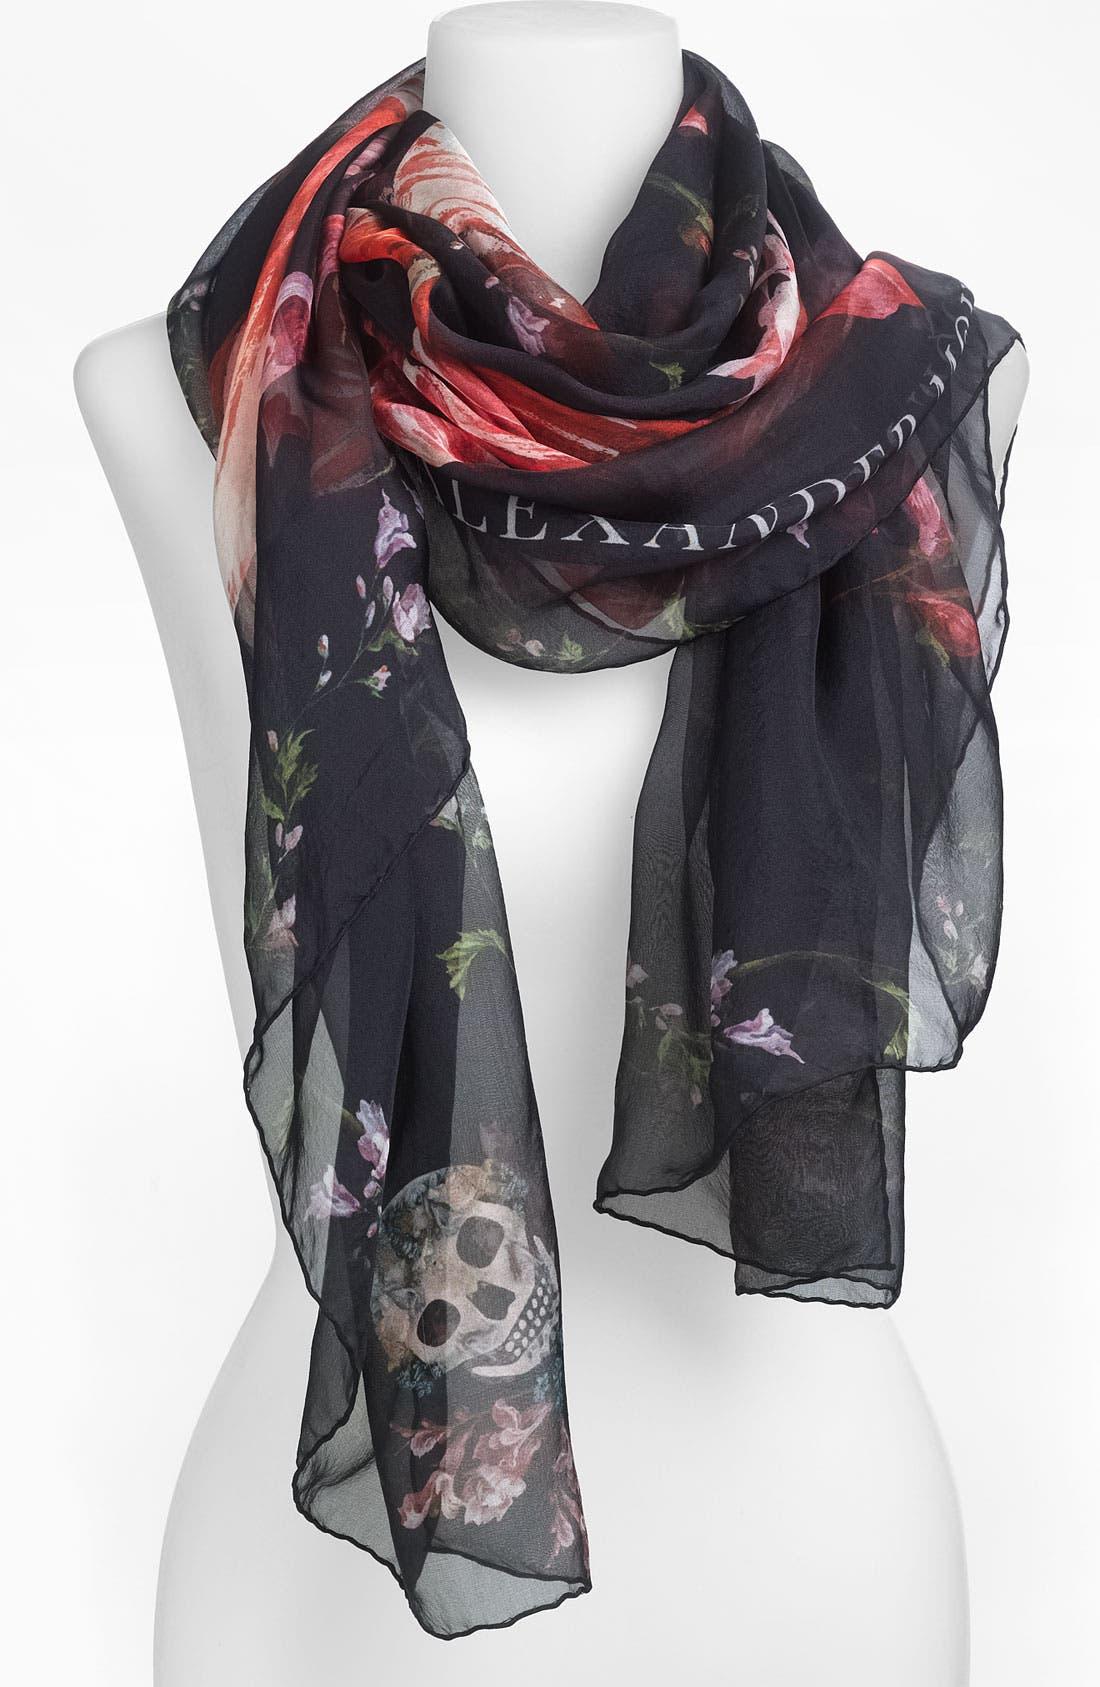 Alternate Image 1 Selected - Alexander McQueen 'Tulip Skull' Scarf